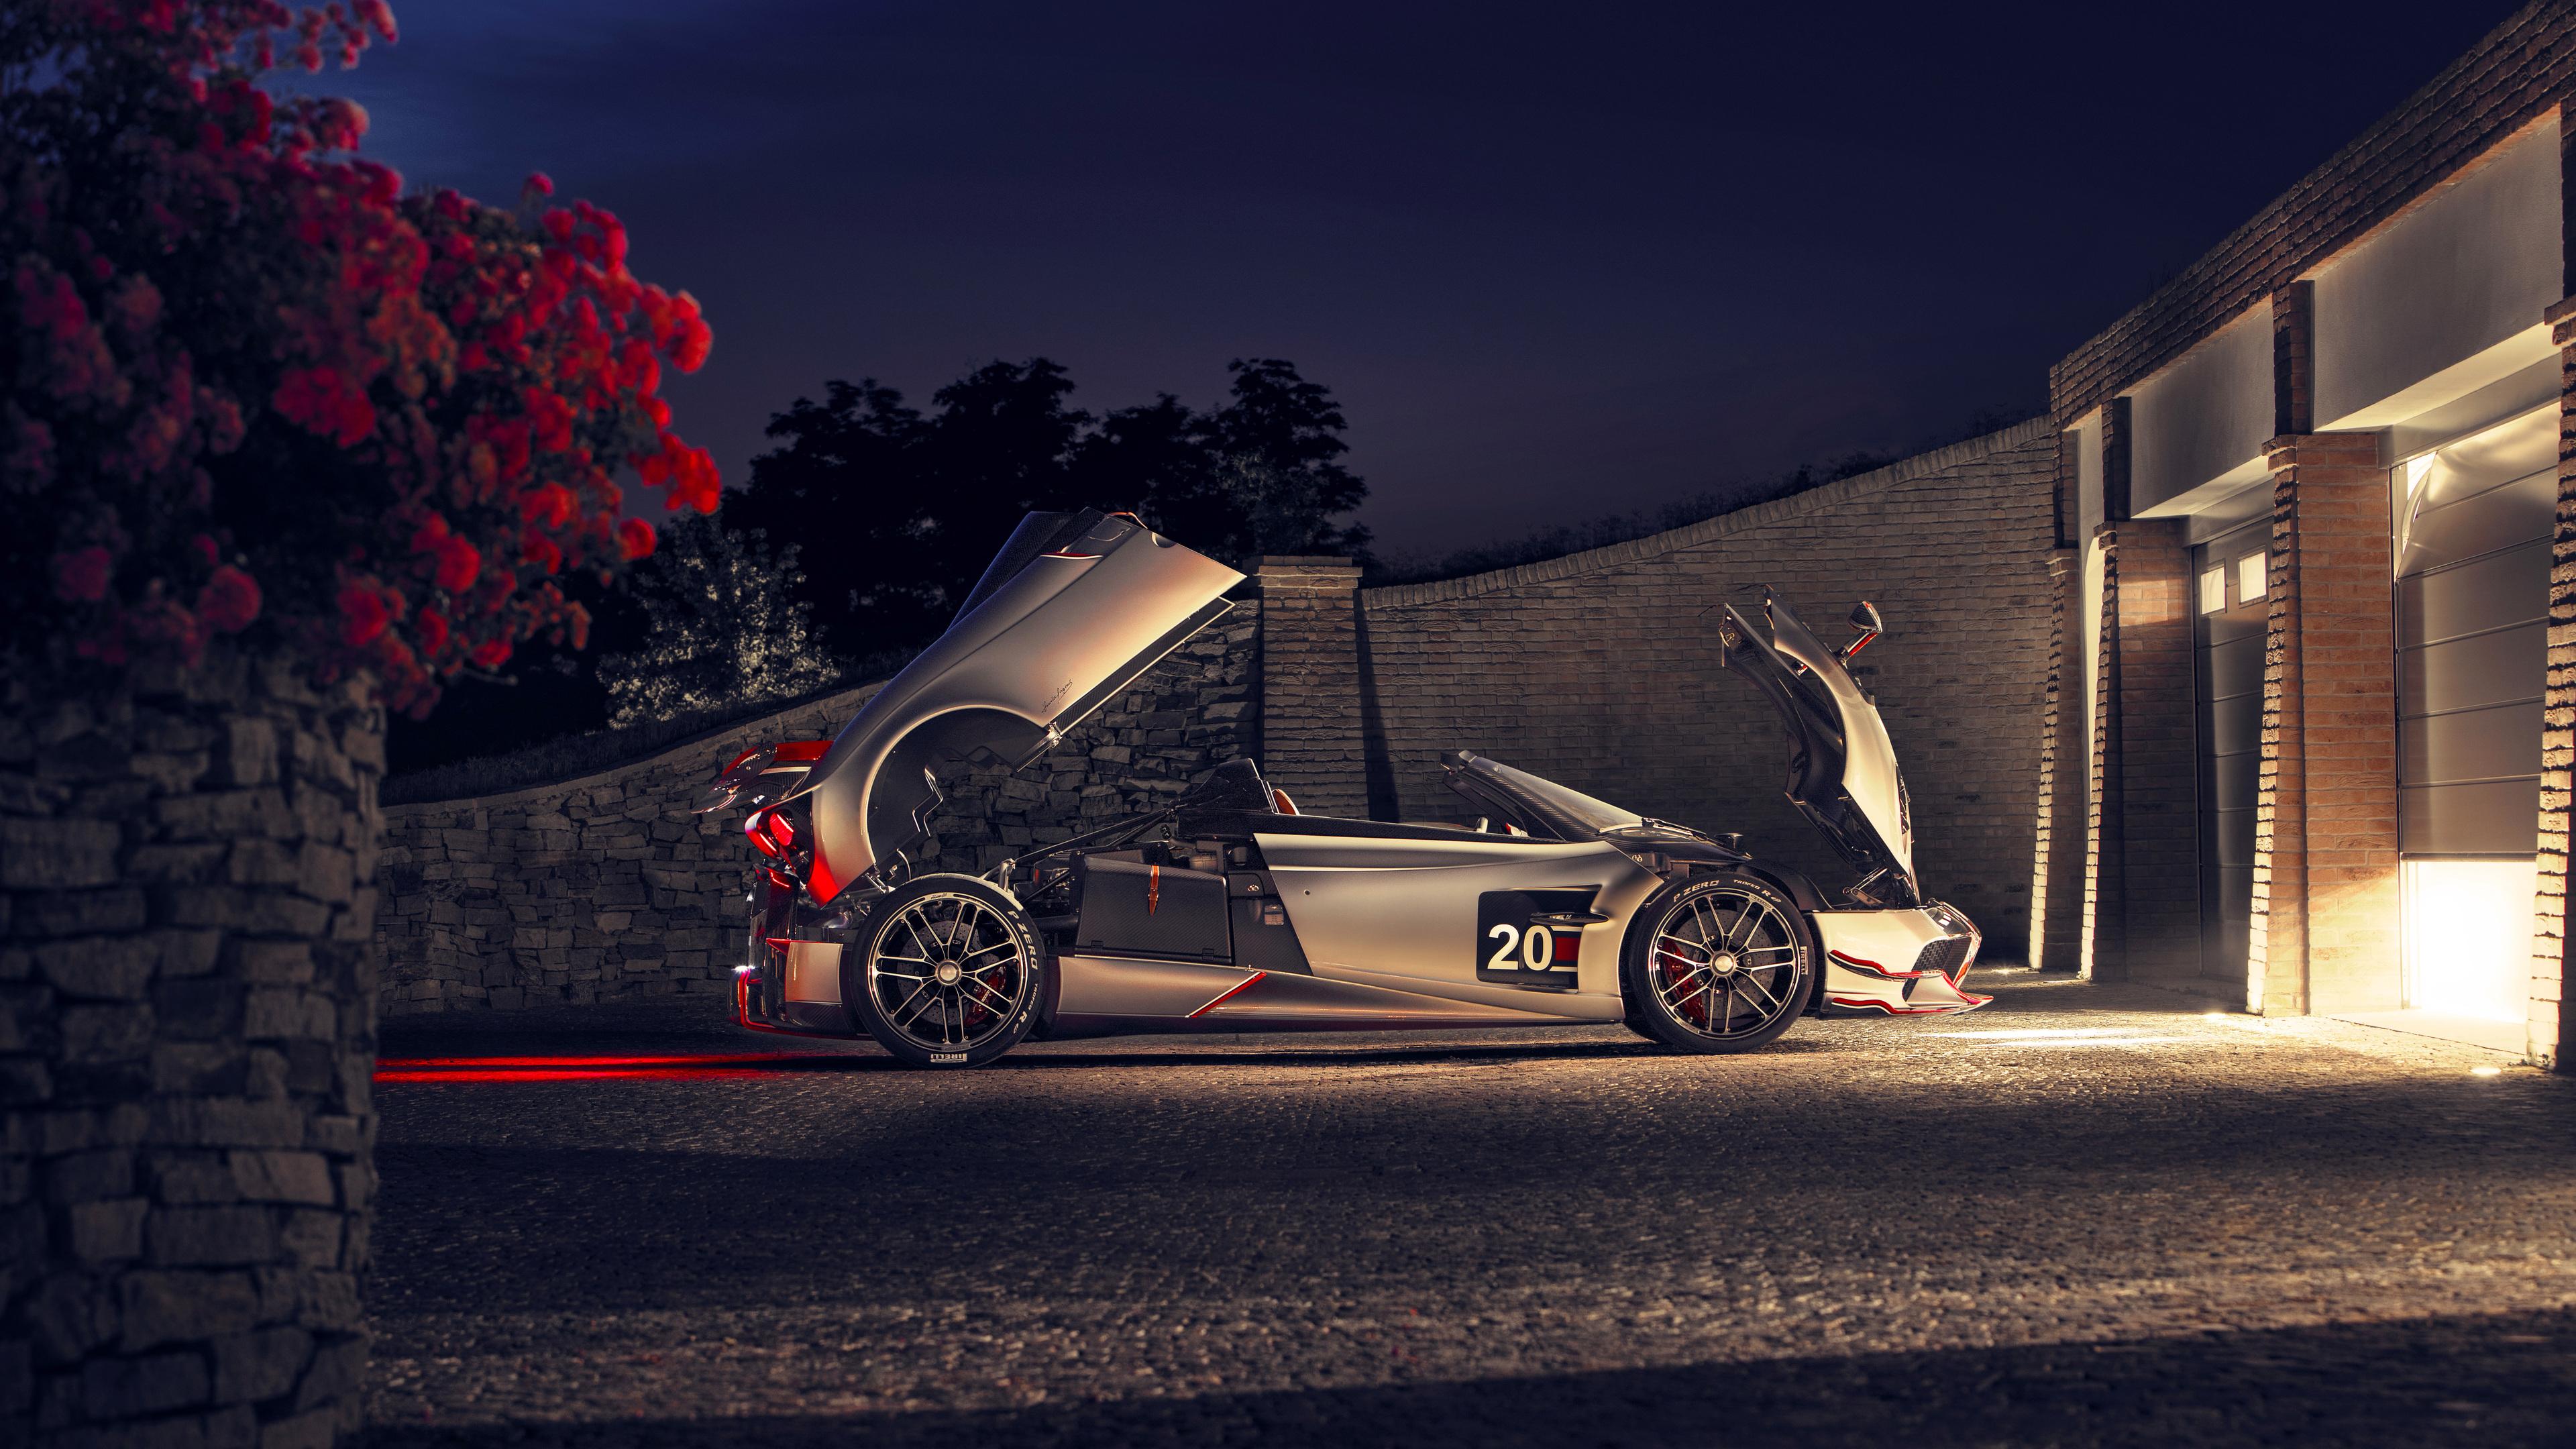 pagani huayra roadster bc 2019 1569188489 - Pagani Huayra Roadster BC 2019 - pagani huayra wallpapers, hd-wallpapers, cars wallpapers, 8k wallpapers, 5k wallpapers, 4k-wallpapers